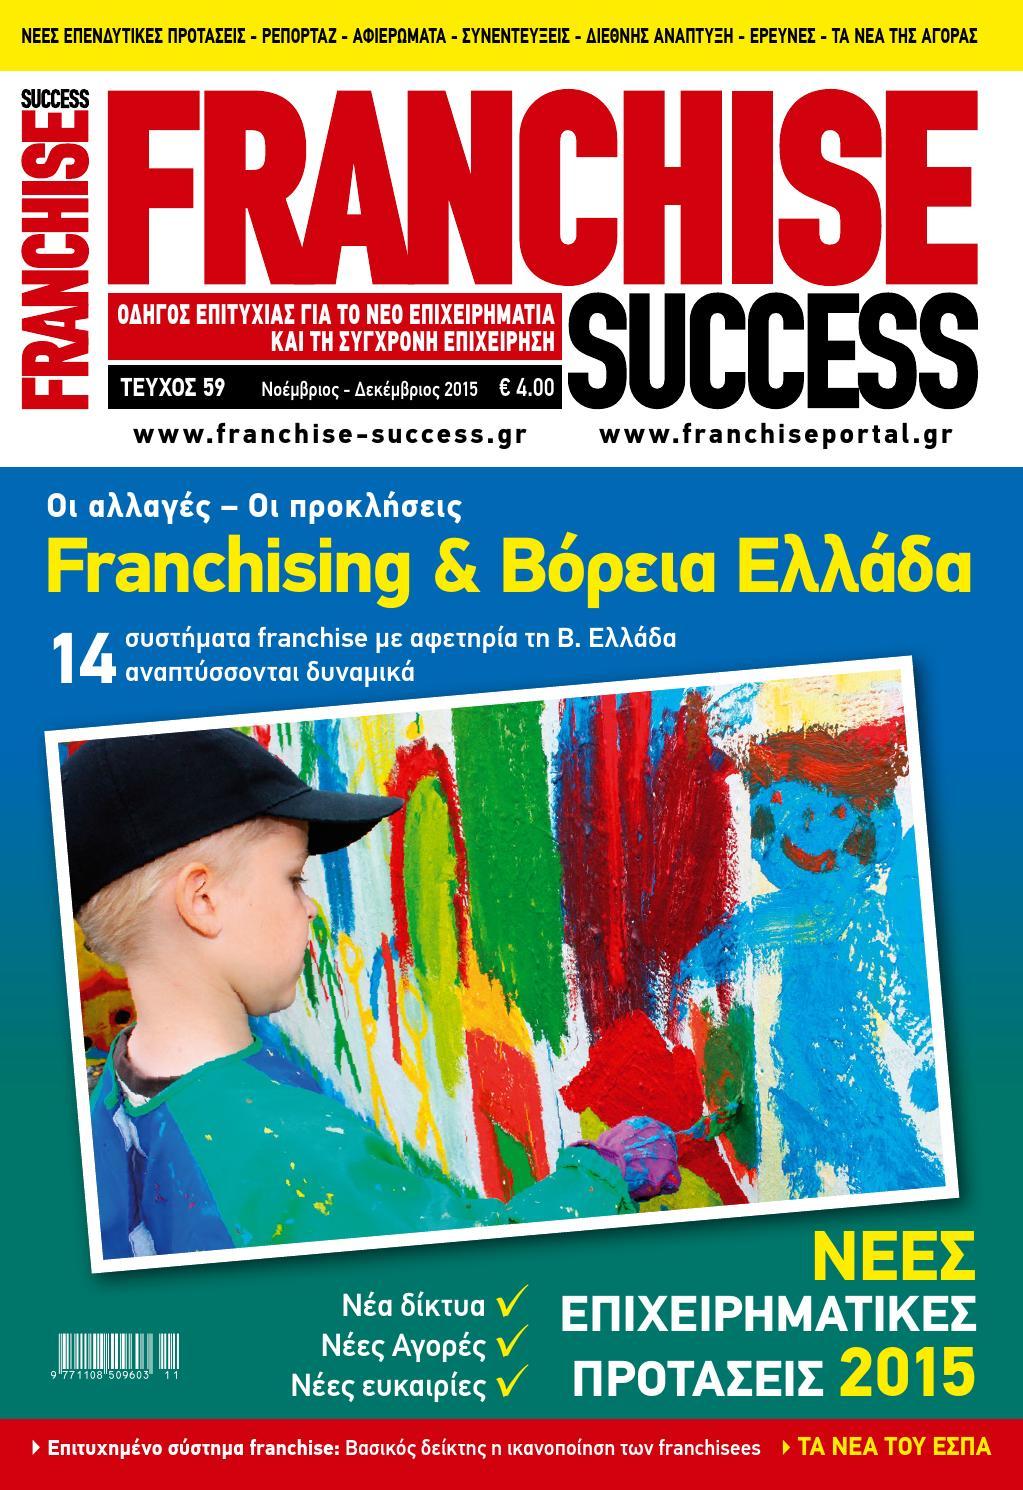 35af21b93a74 Franchise Success Τεύχος 59 Νοέμβριος - Δεκέμβριος 2015 by franchise  success - issuu